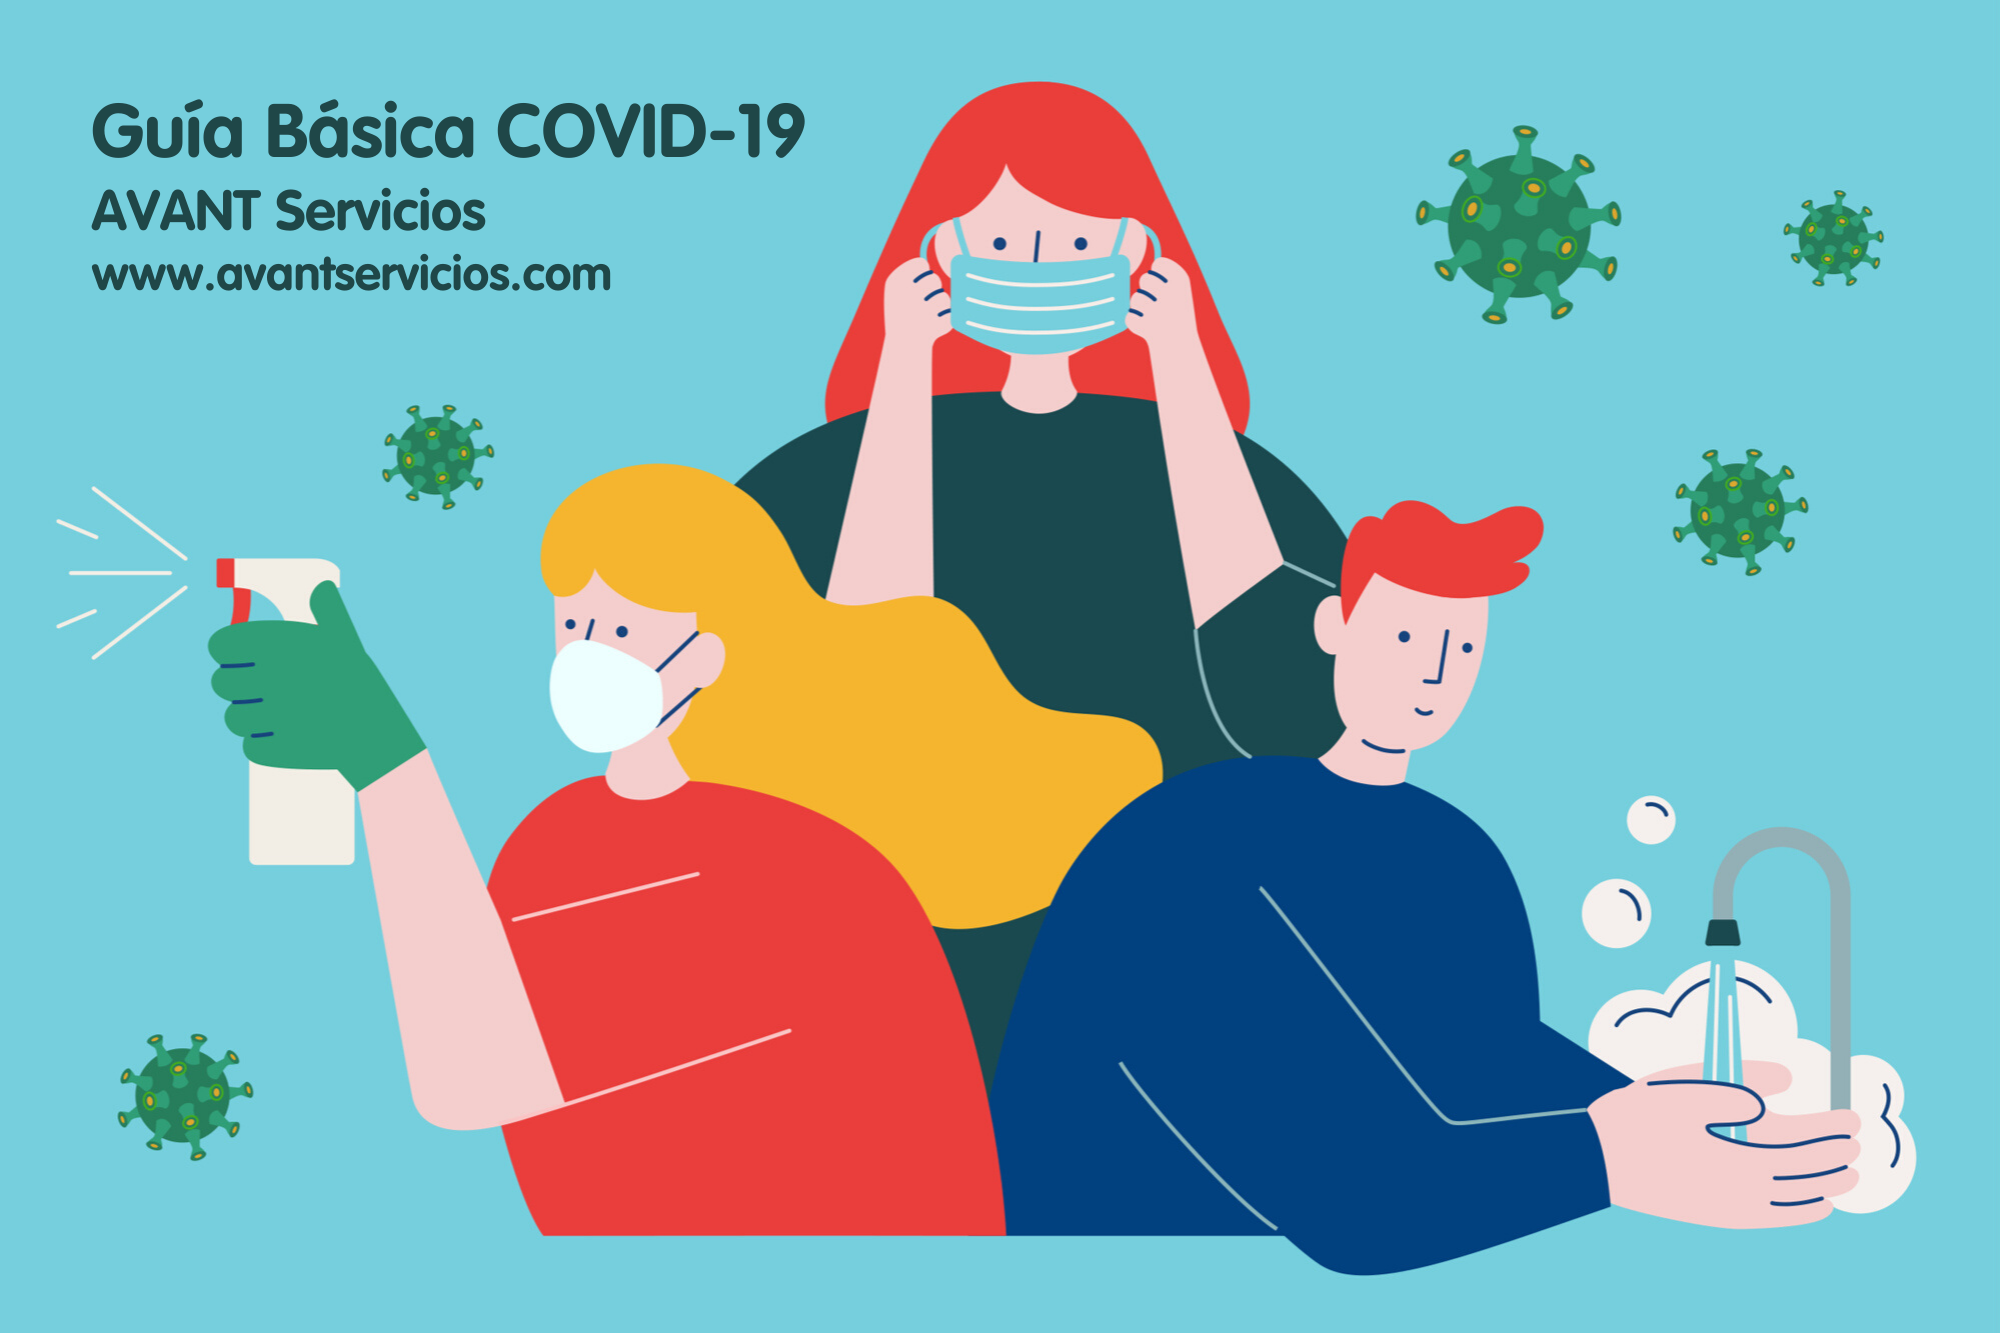 En AVANT Servicios, estamos contigo frente al coronavirus